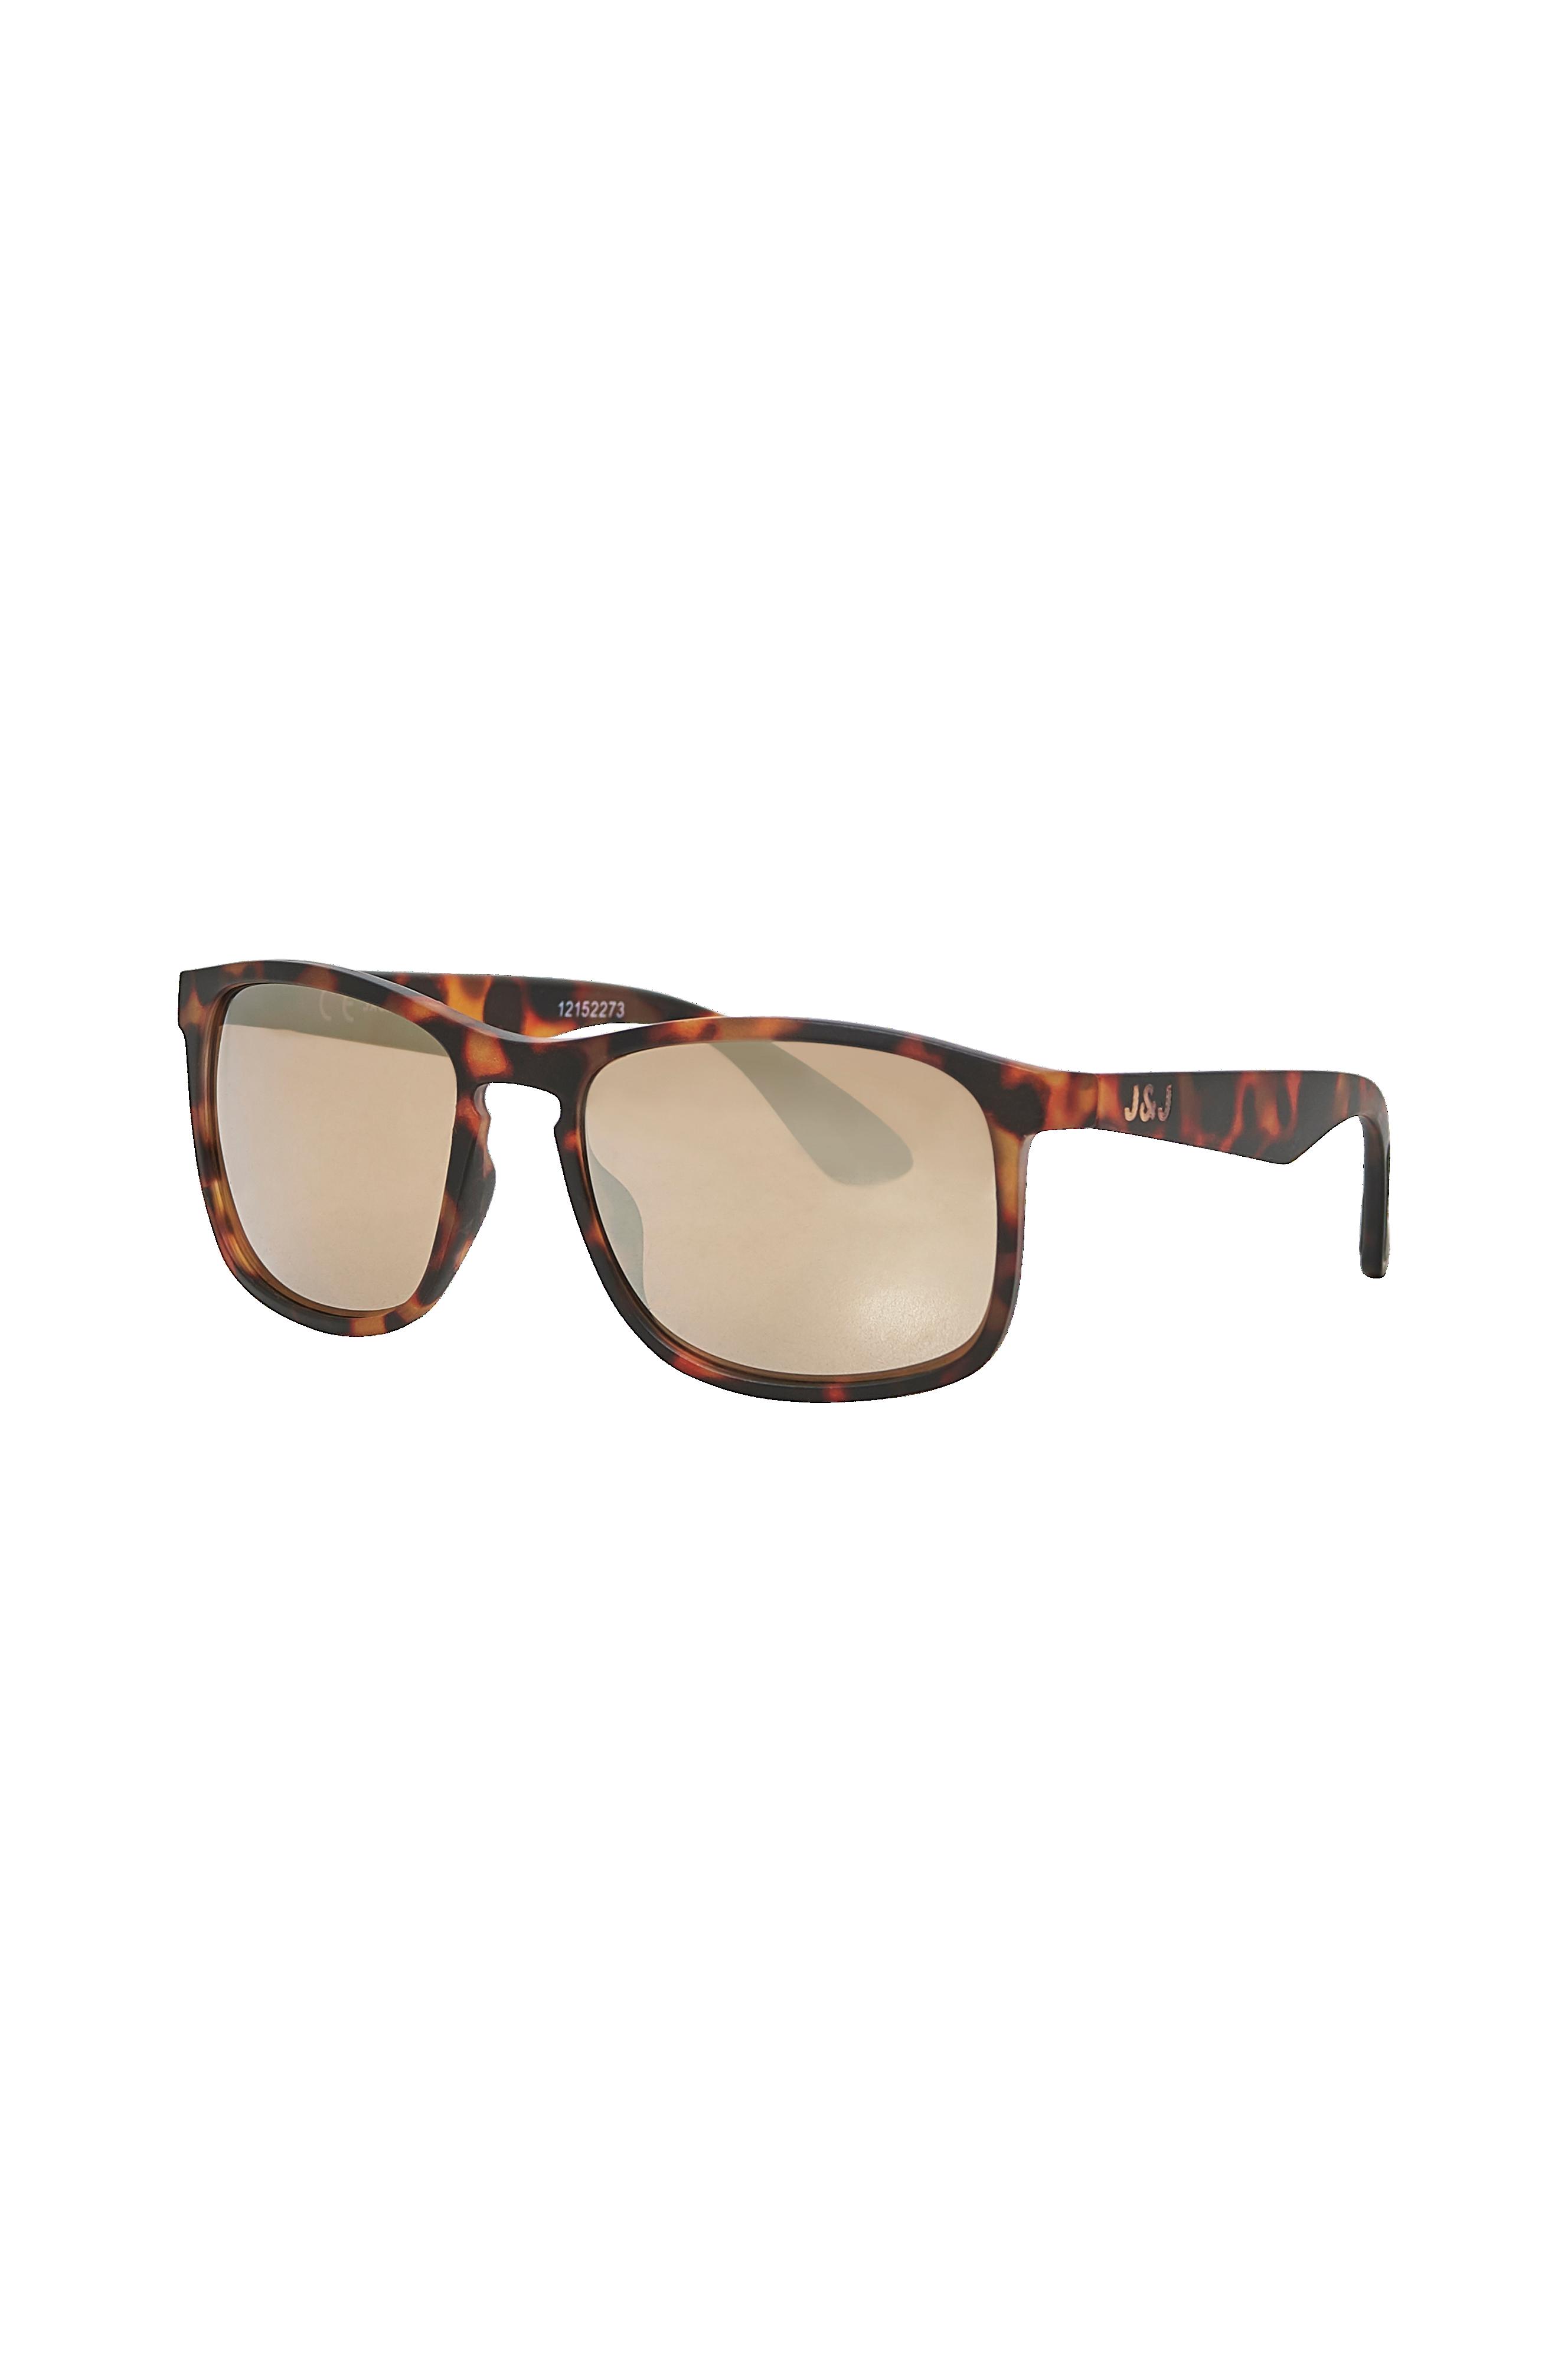 Sunglasses shop rabattkod